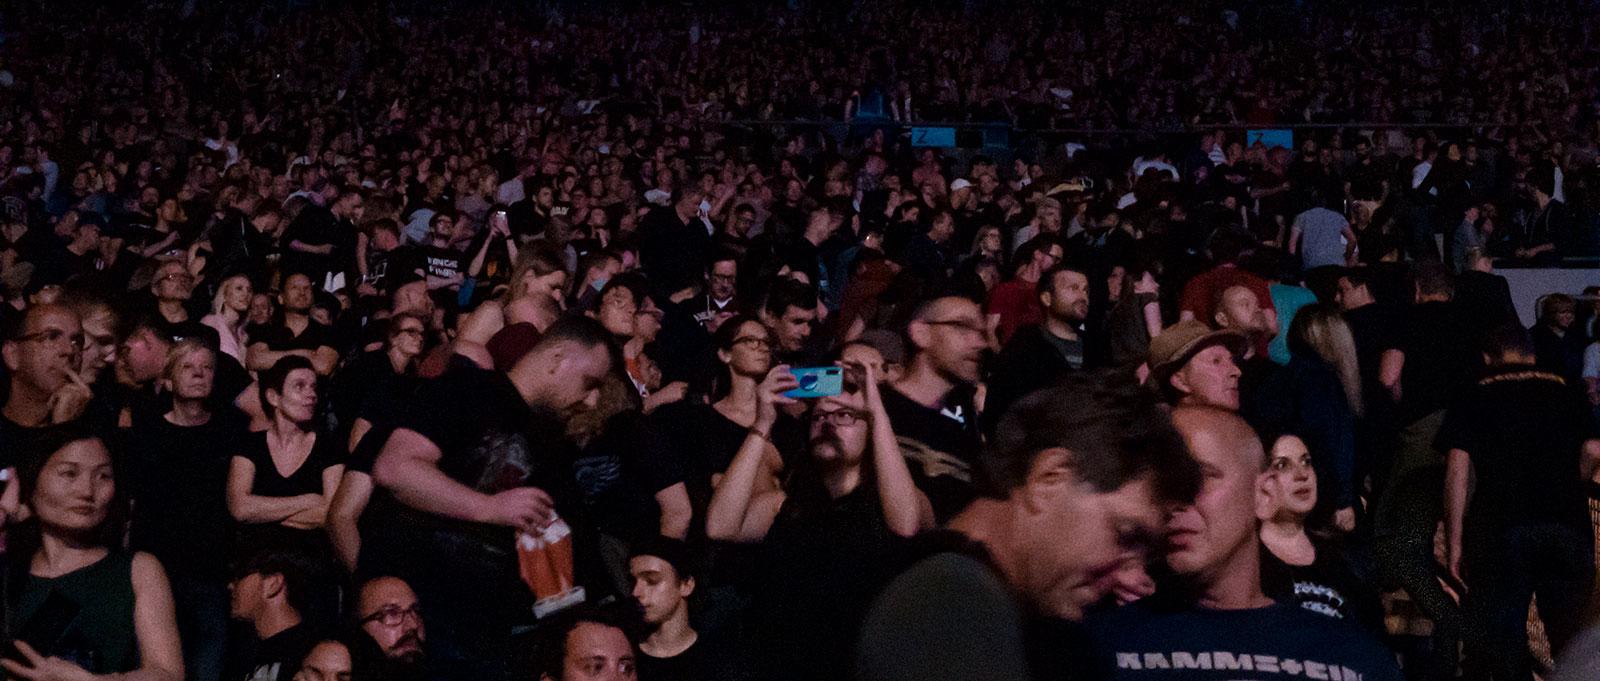 2019-06-09_MUC_Rammstein_Olympiastadion114_(2,35-1,8Bit,72dpi,sRGB).jpg